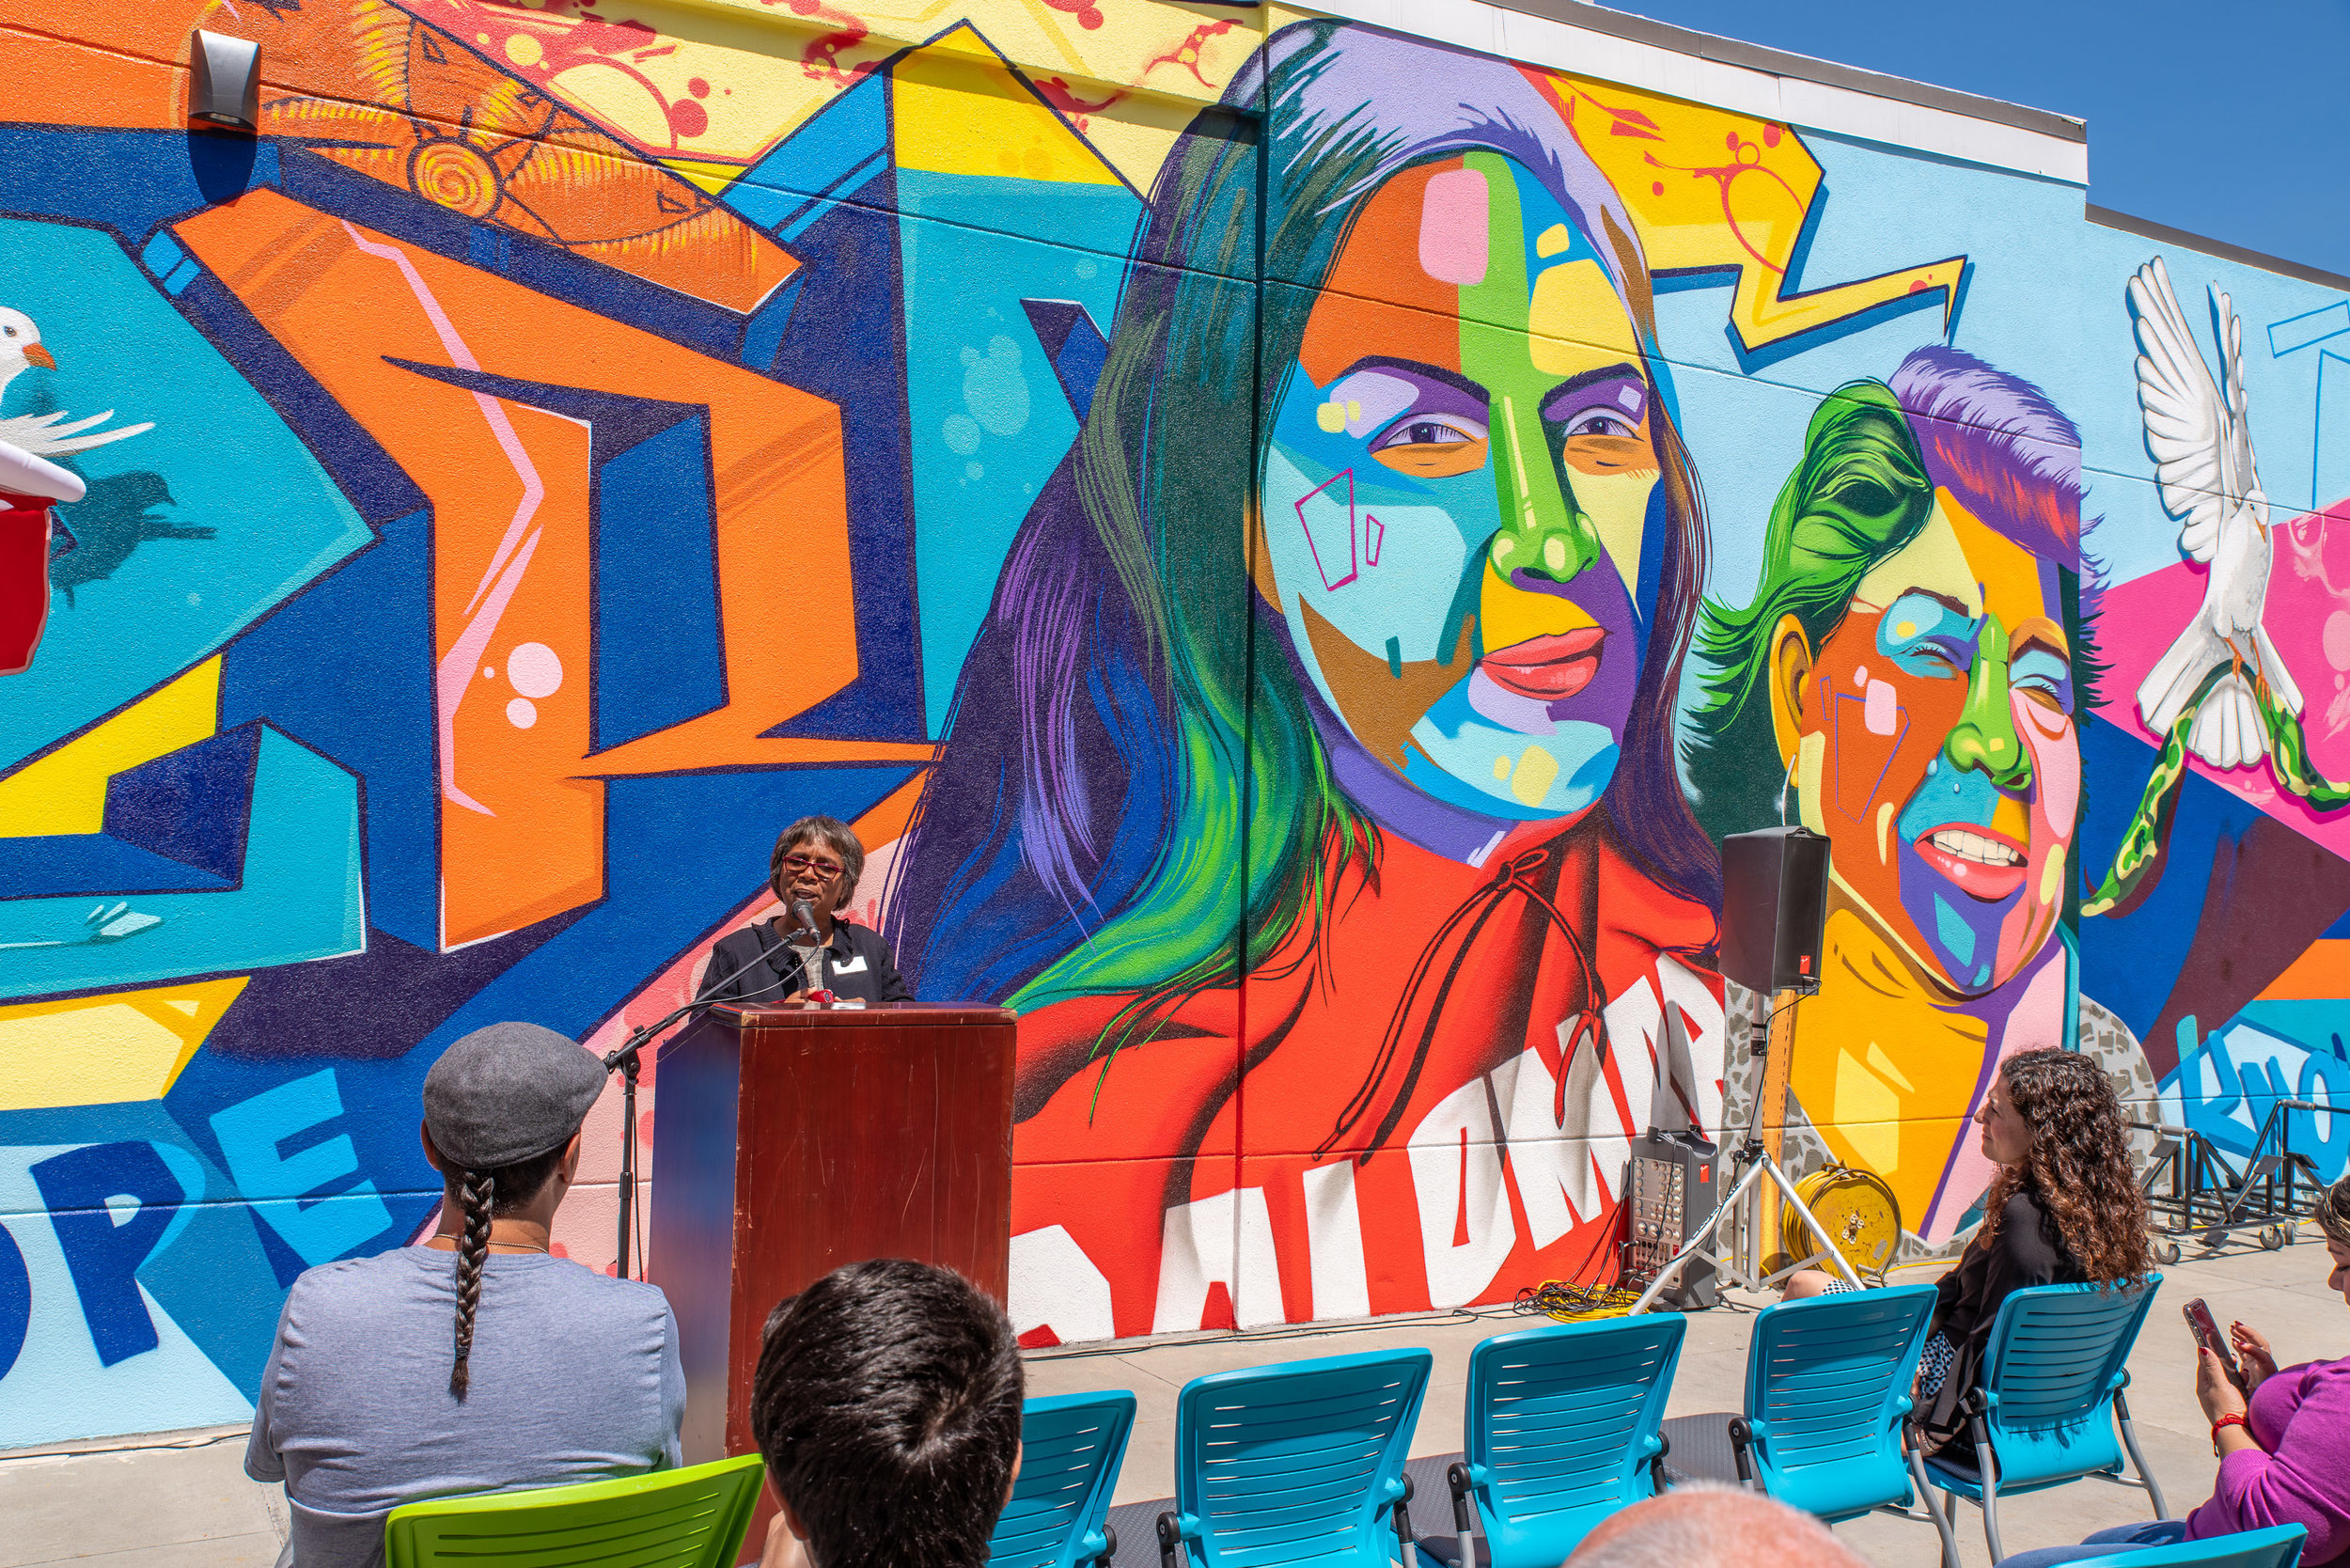 2019-05-14-man-one-mural-k-1-imgp2388_40898299093_o.jpg